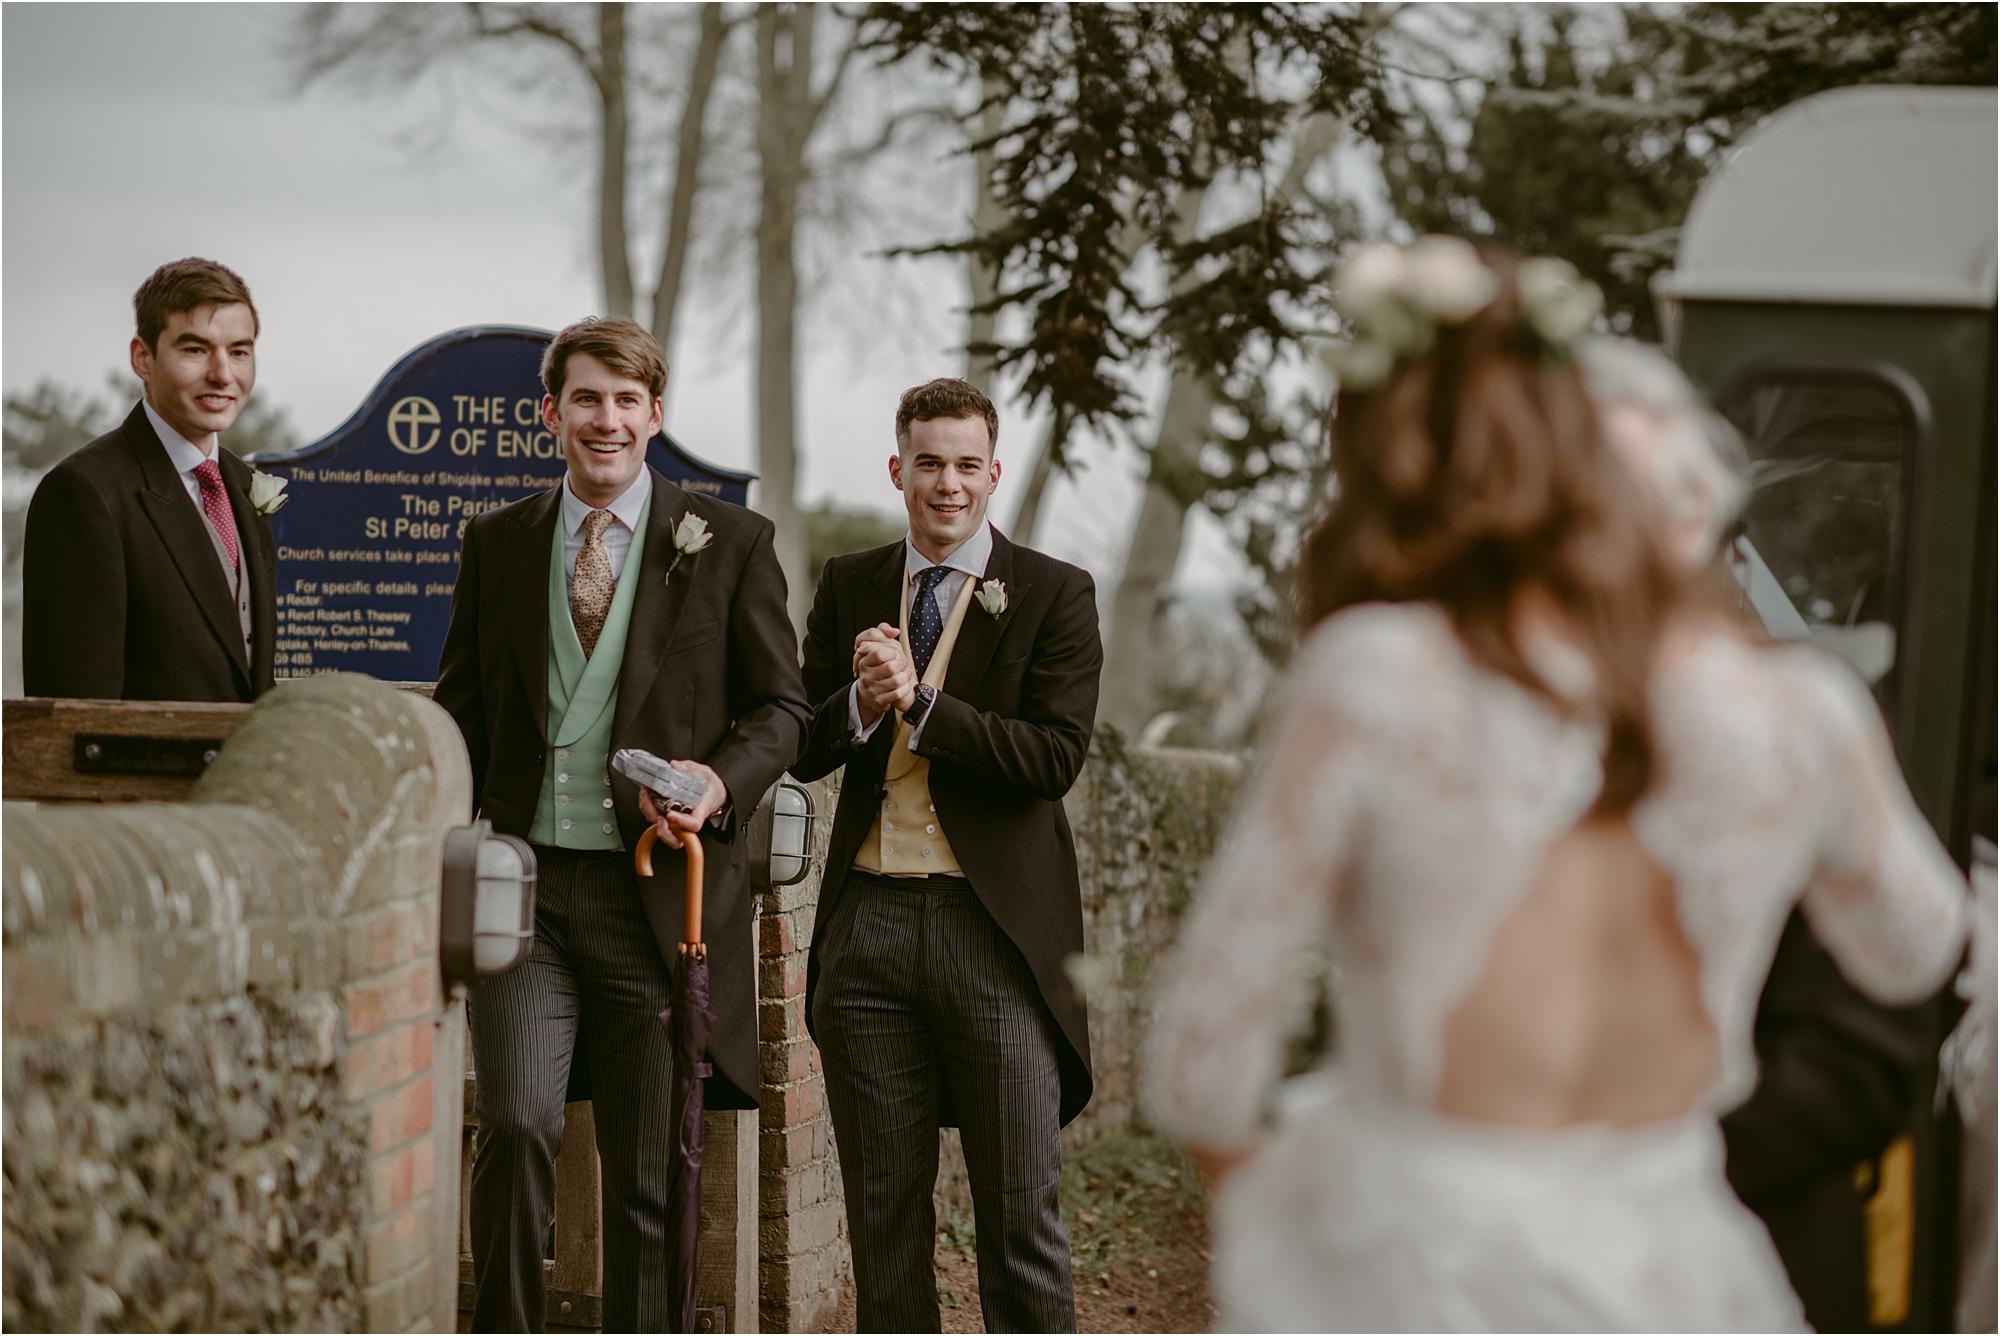 Rose+Harry-outdoor-english-wedding-photography__0046.jpg